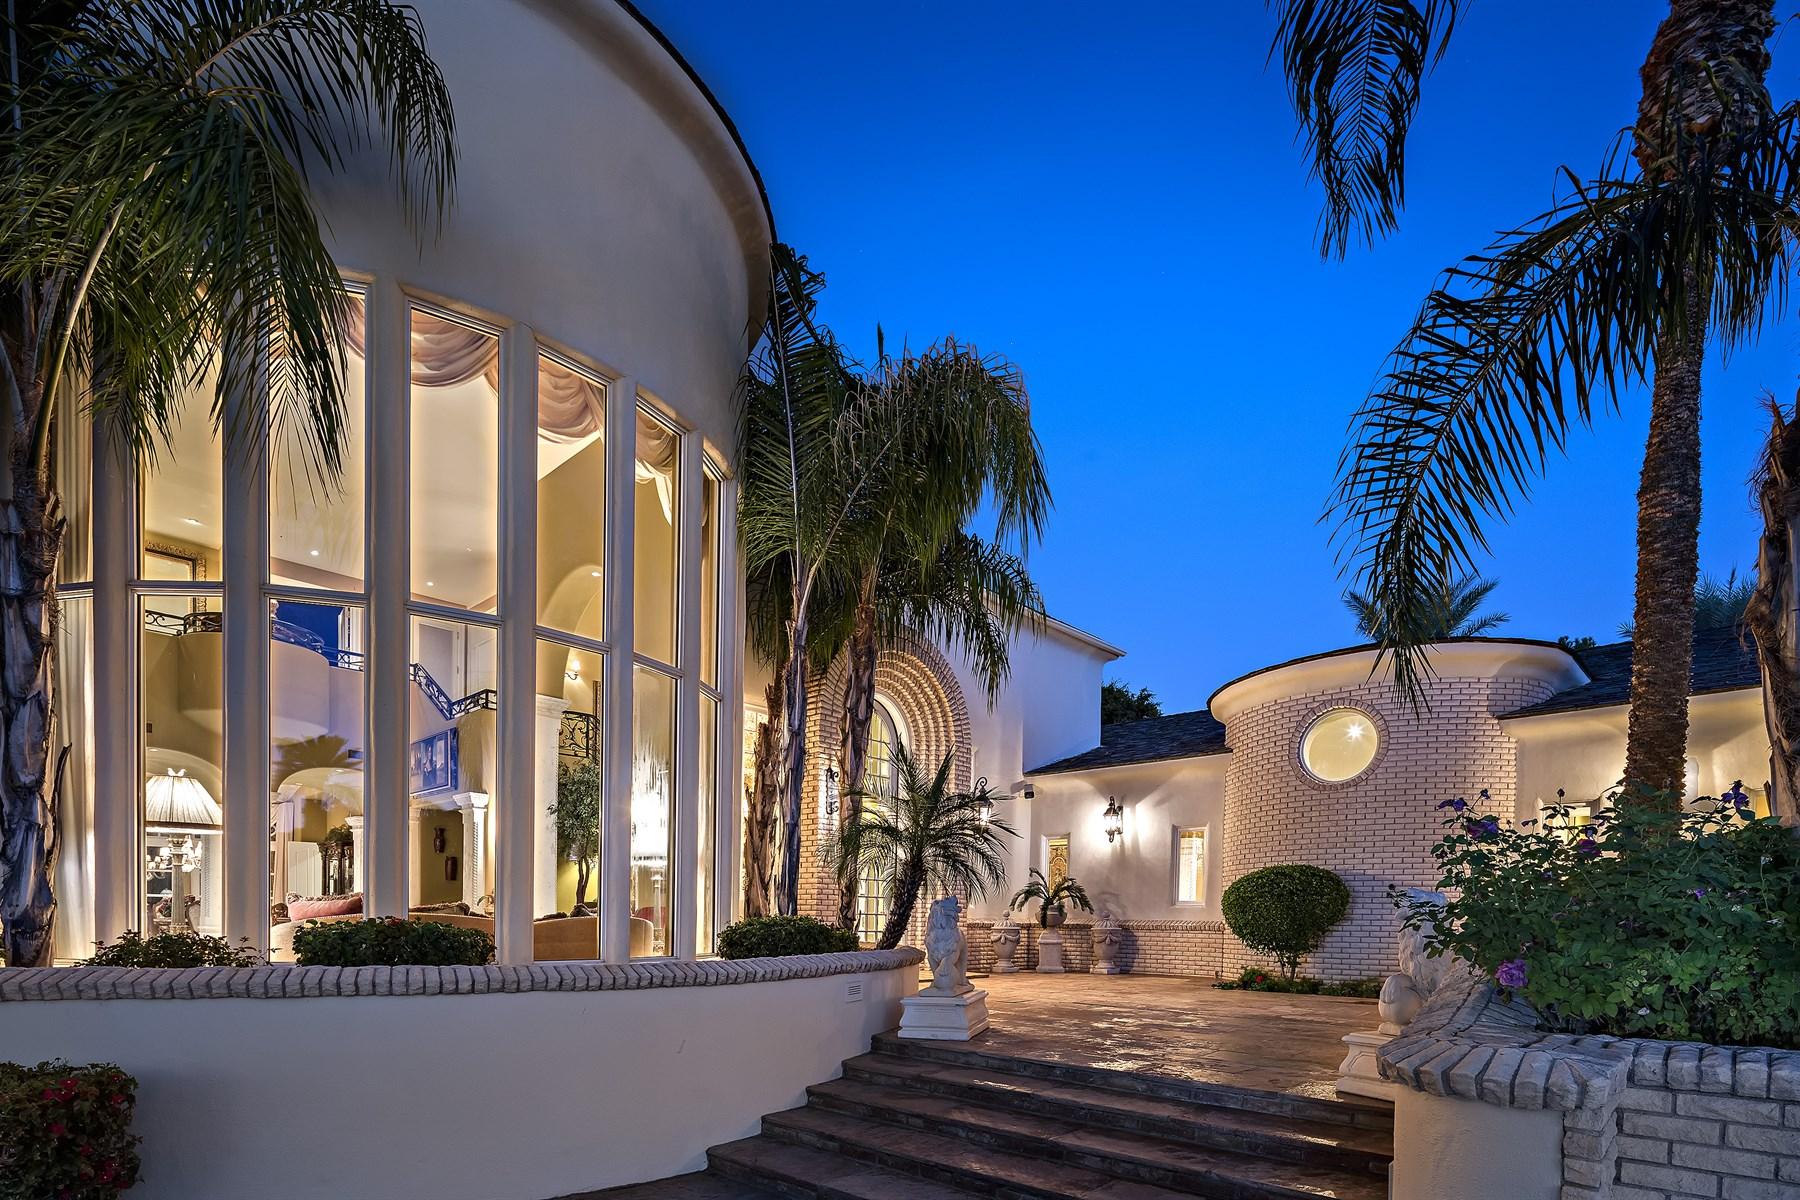 Tek Ailelik Ev için Satış at Custom home on huge 1.6 acre lot on Camelback Country Estates 6042 E Via Los Caballos Paradise Valley, Arizona, 85253 Amerika Birleşik Devletleri